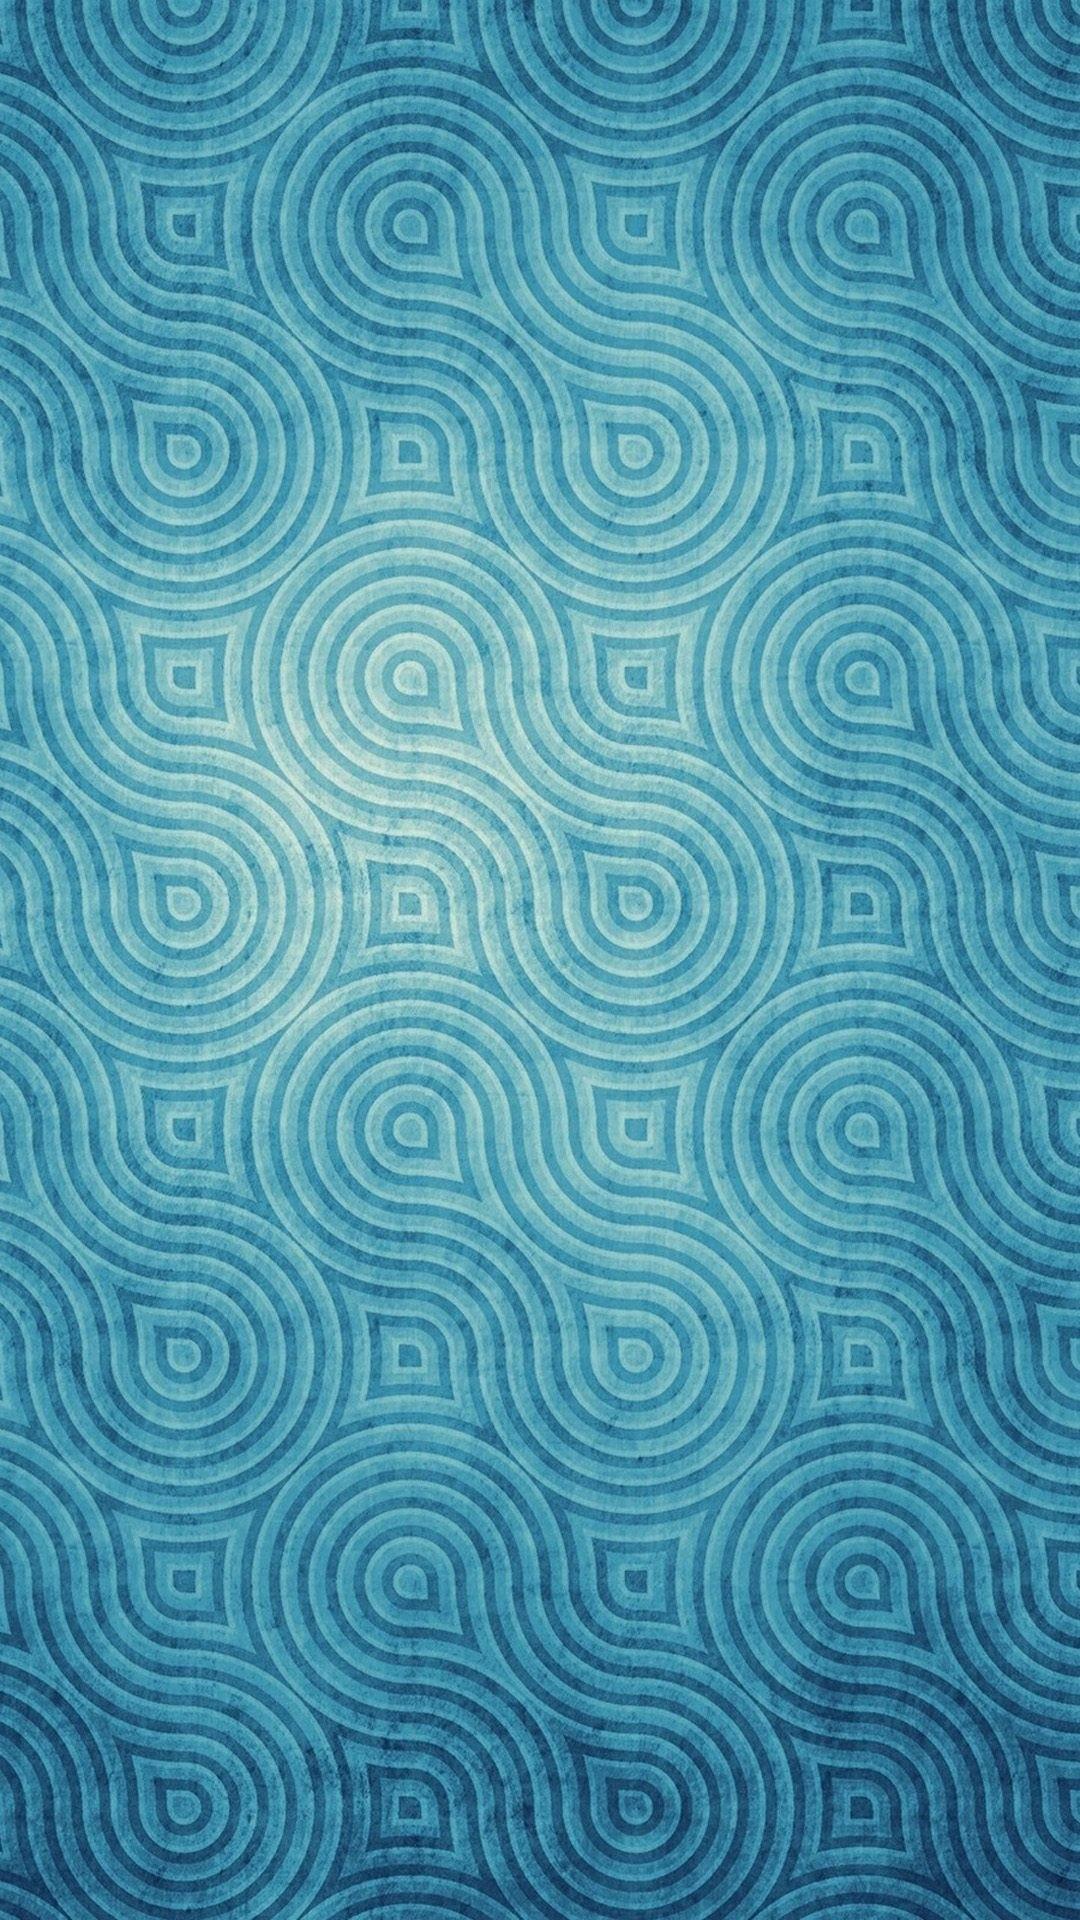 Pattern iphone 5 wallpaper